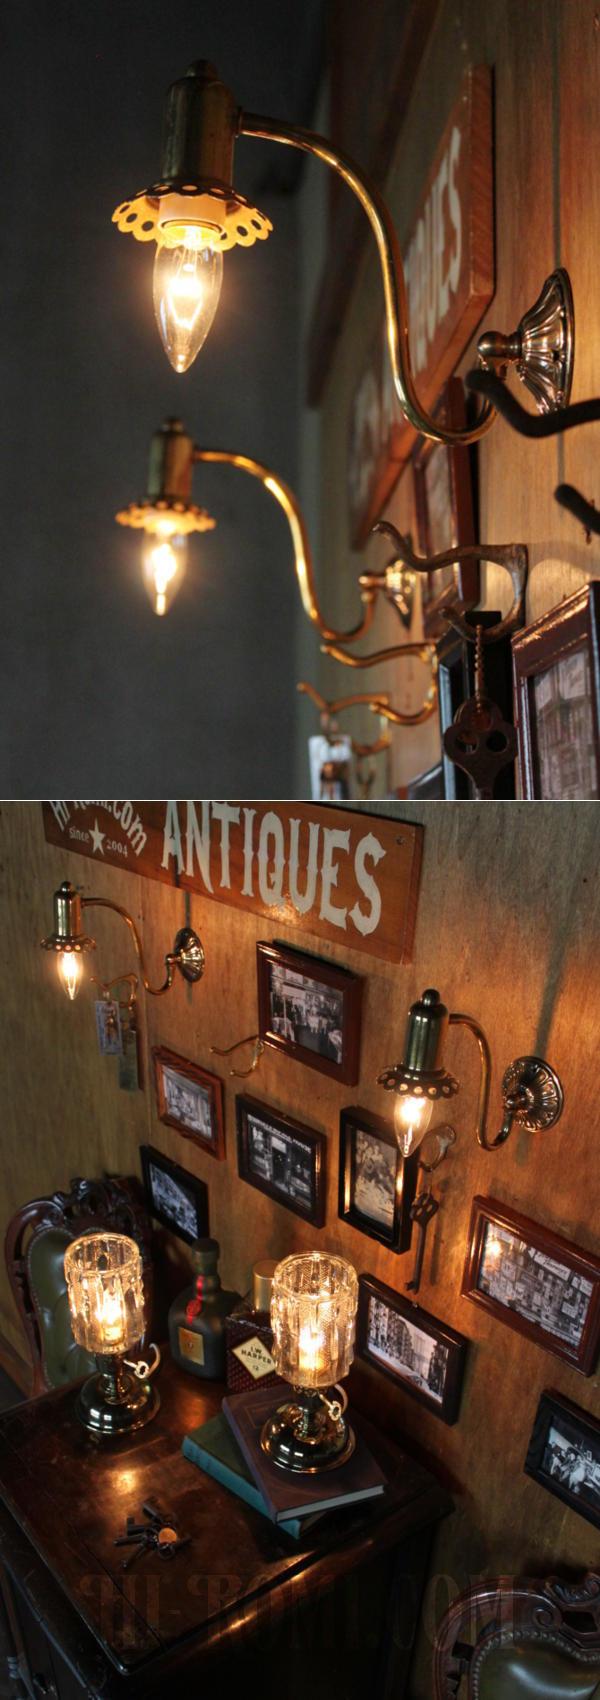 USAヴィンテージ真鍮製花形カップ付きコロニアルブラケット/アンティークヴィクトリアン照明壁掛ランプ